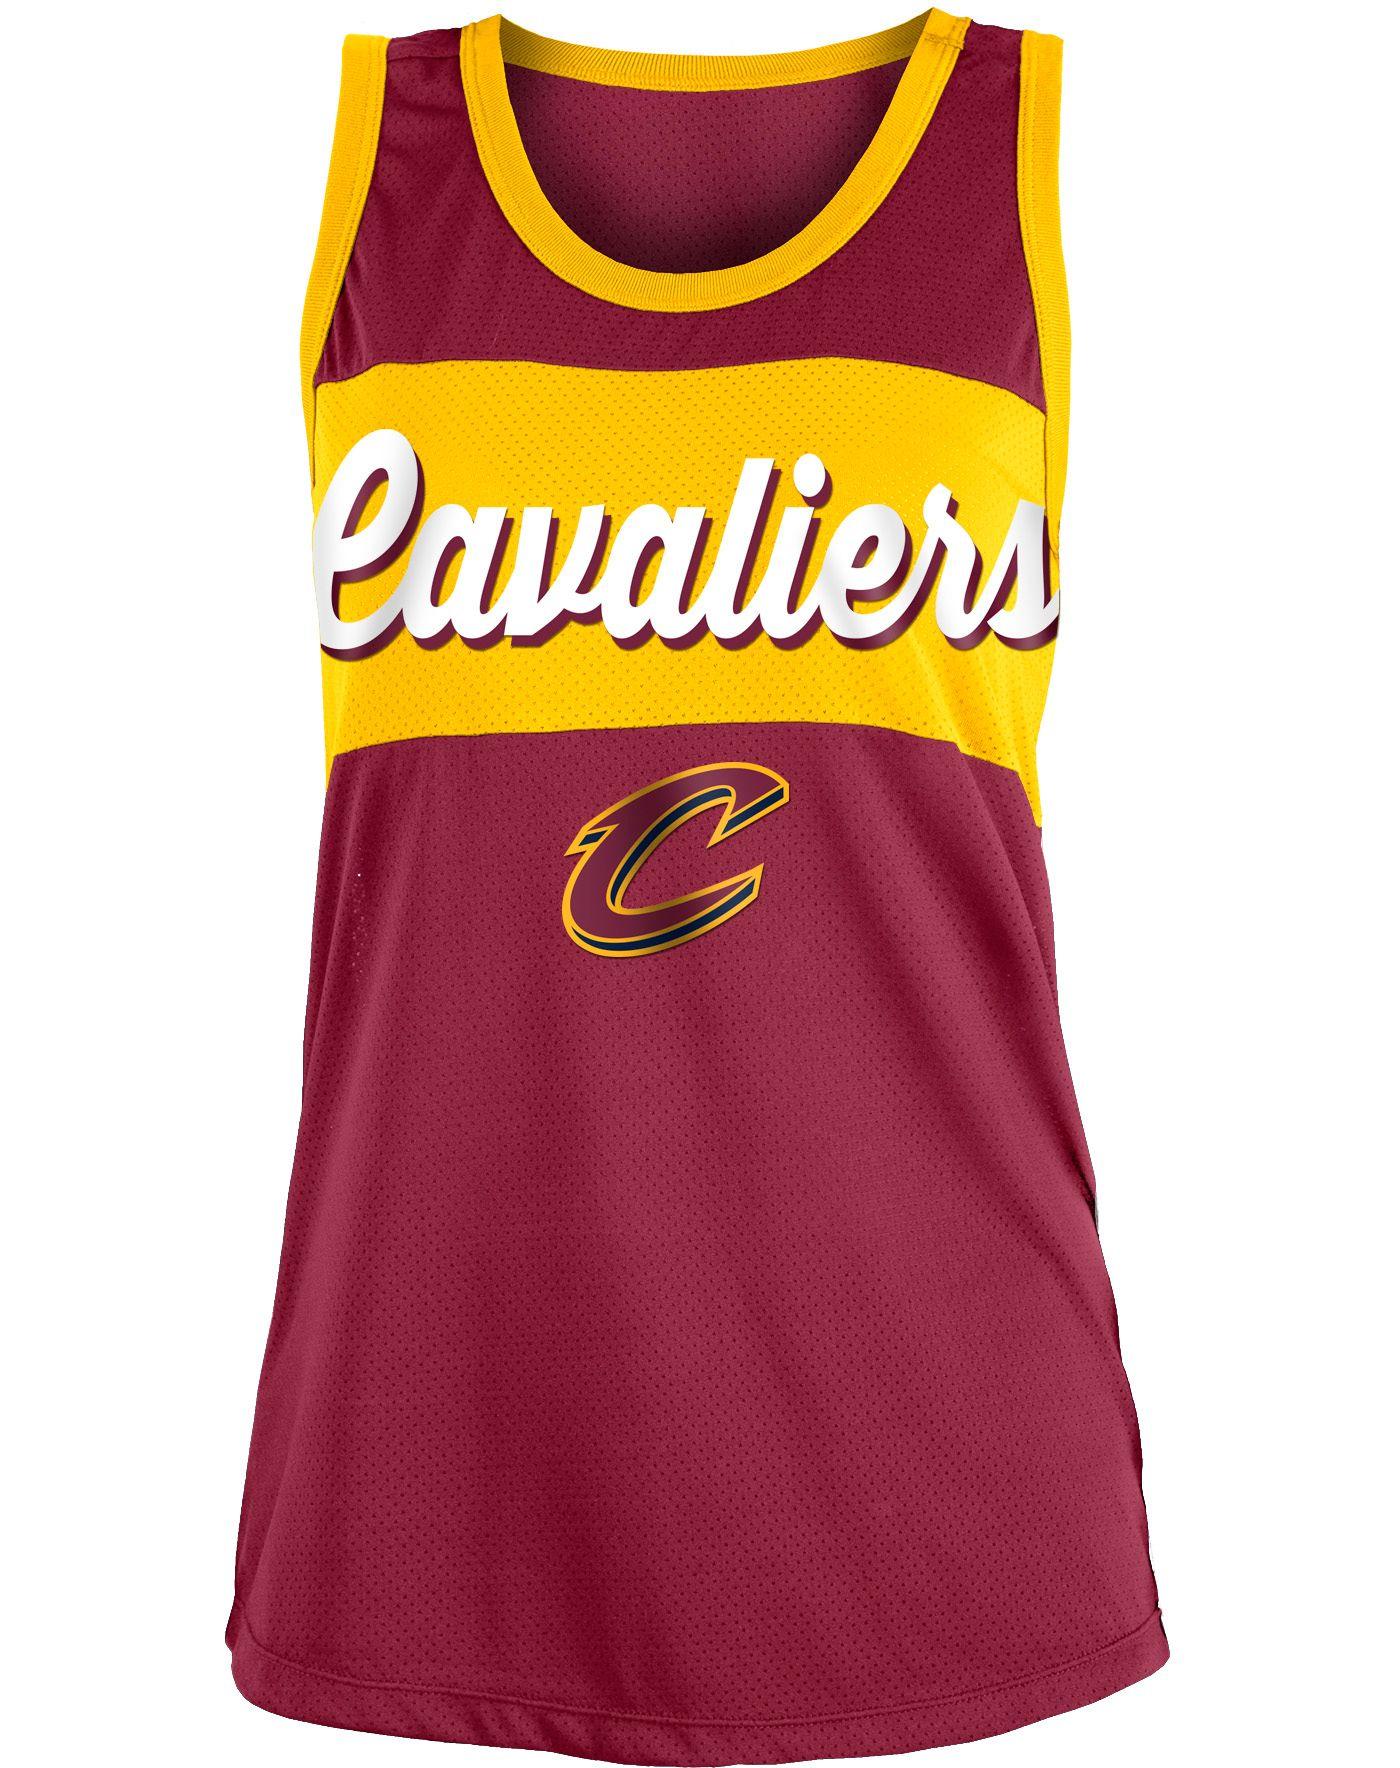 New Era Women's Cleveland Cavaliers Mesh Tank